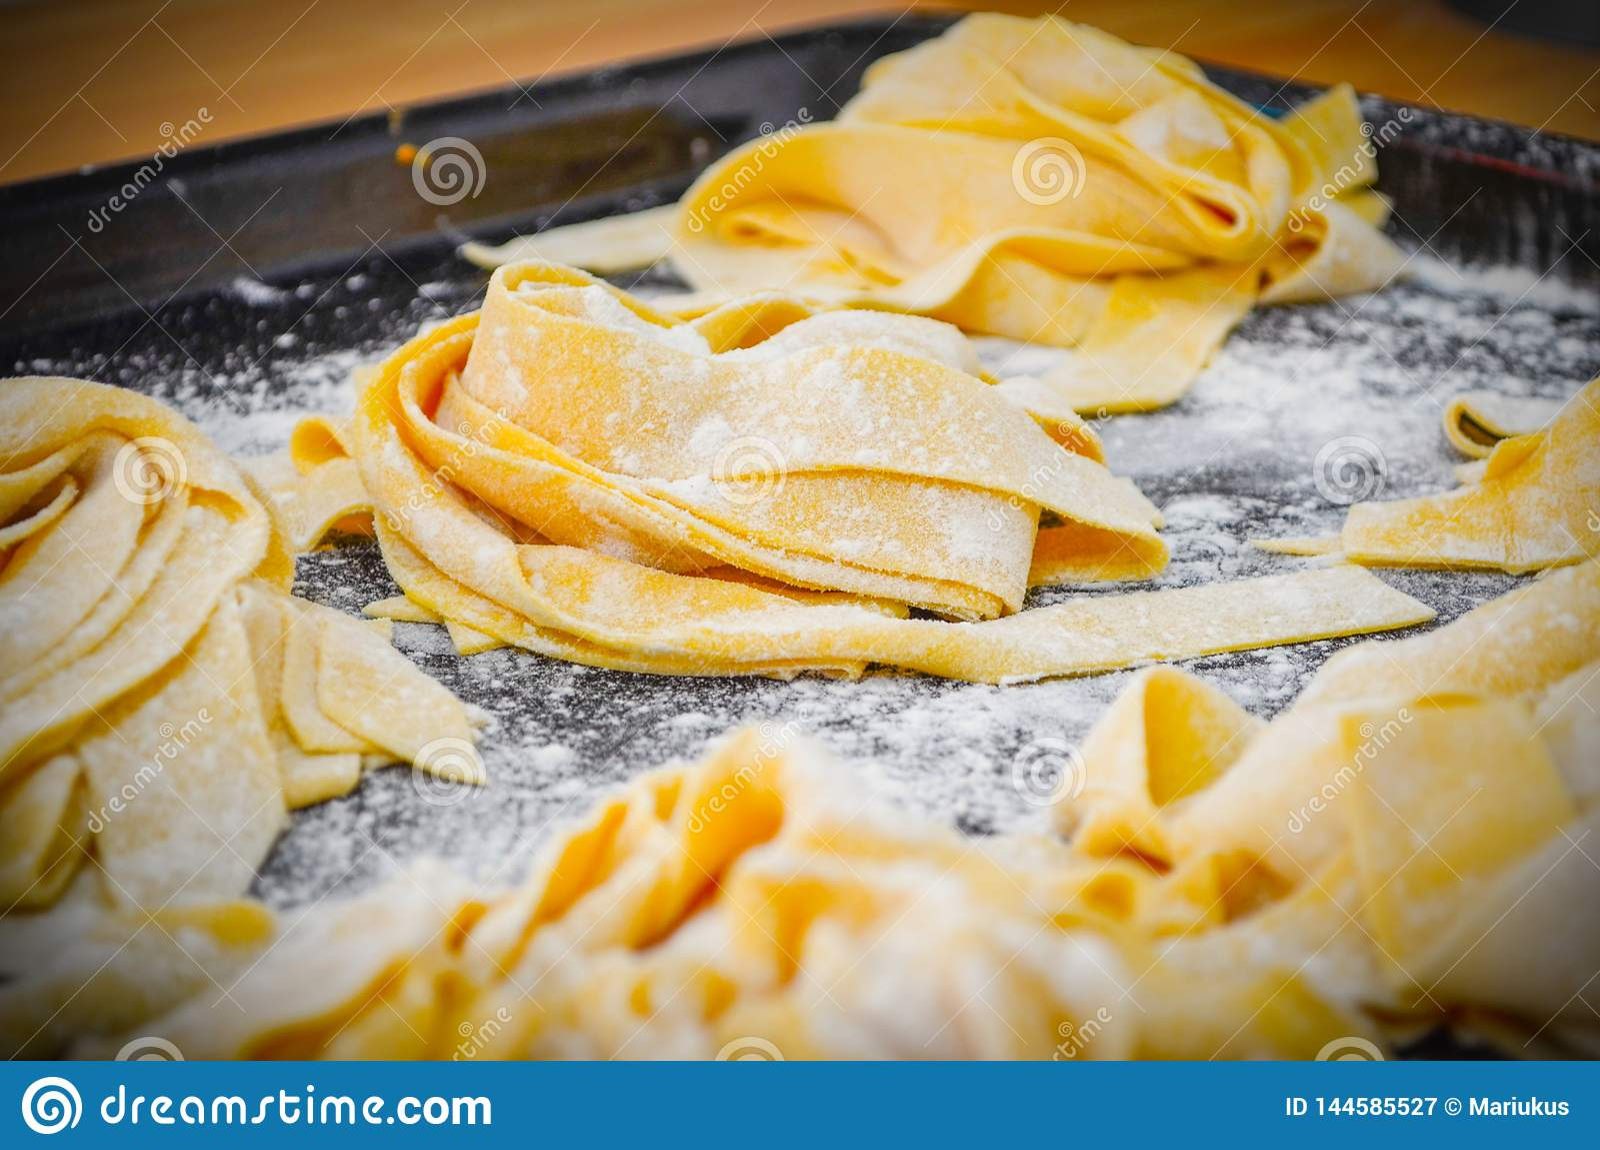 Classic Italian Pappardelle Pasta